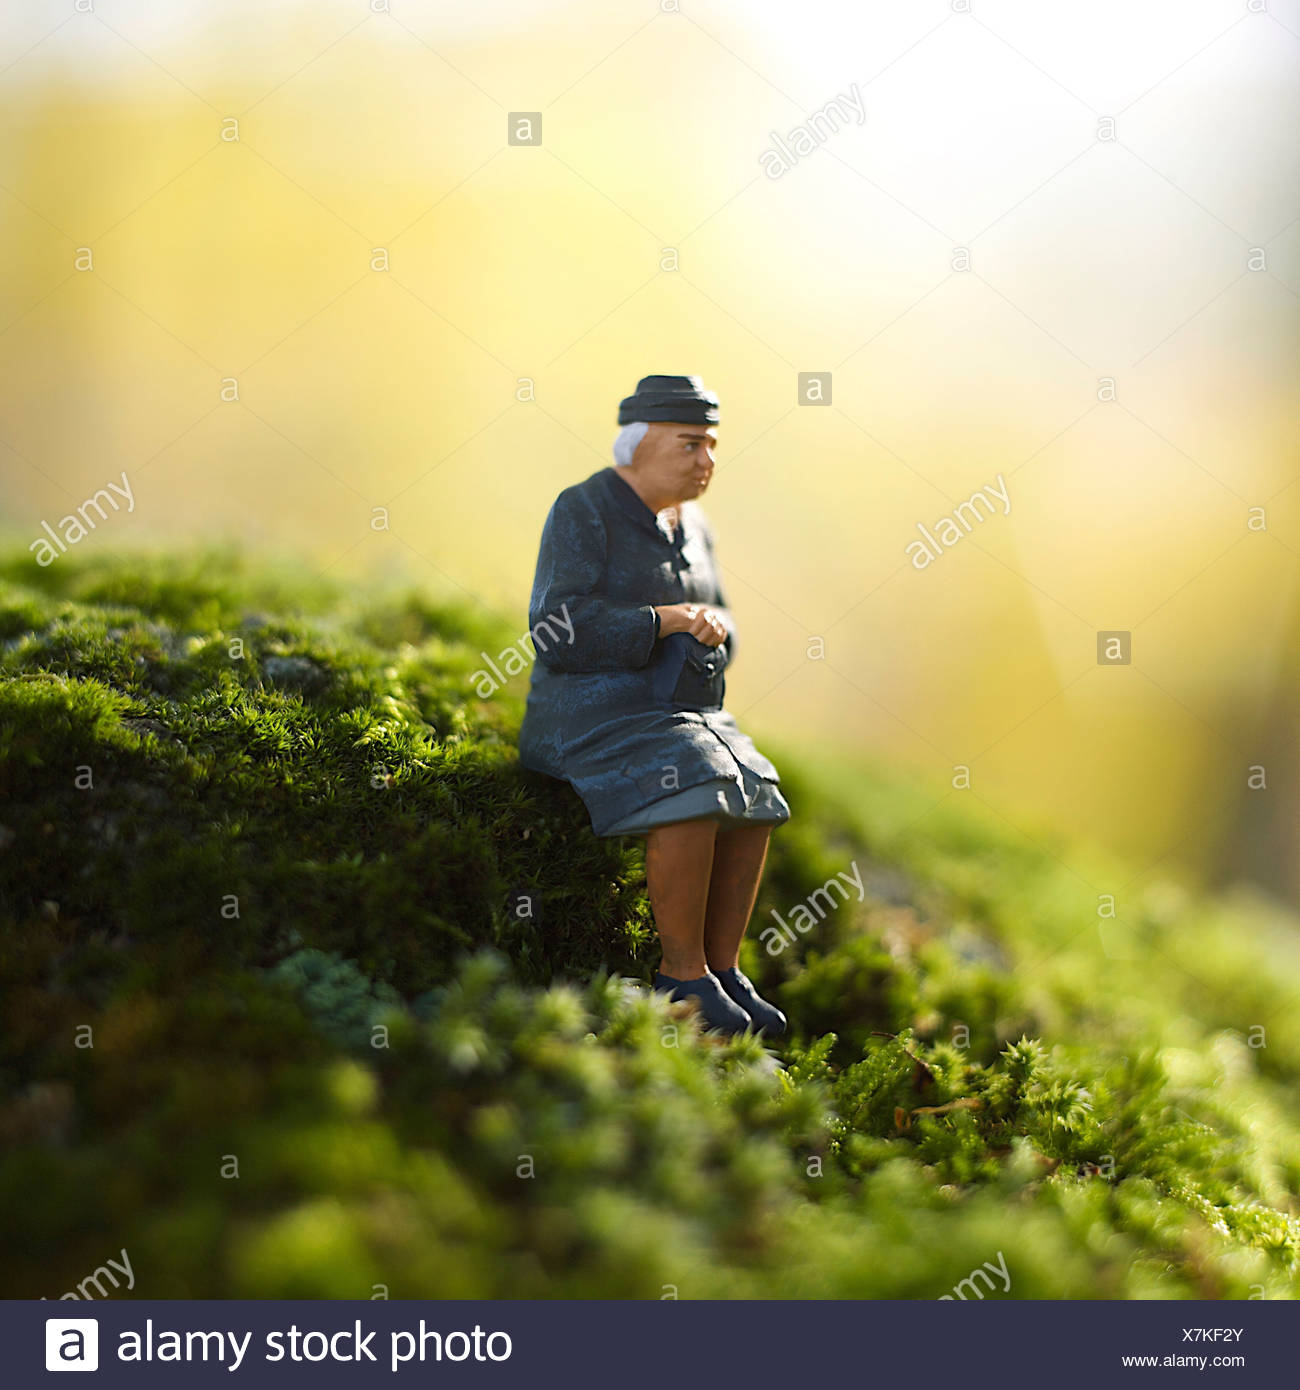 Solitary elderly female figure alone - Stock Image